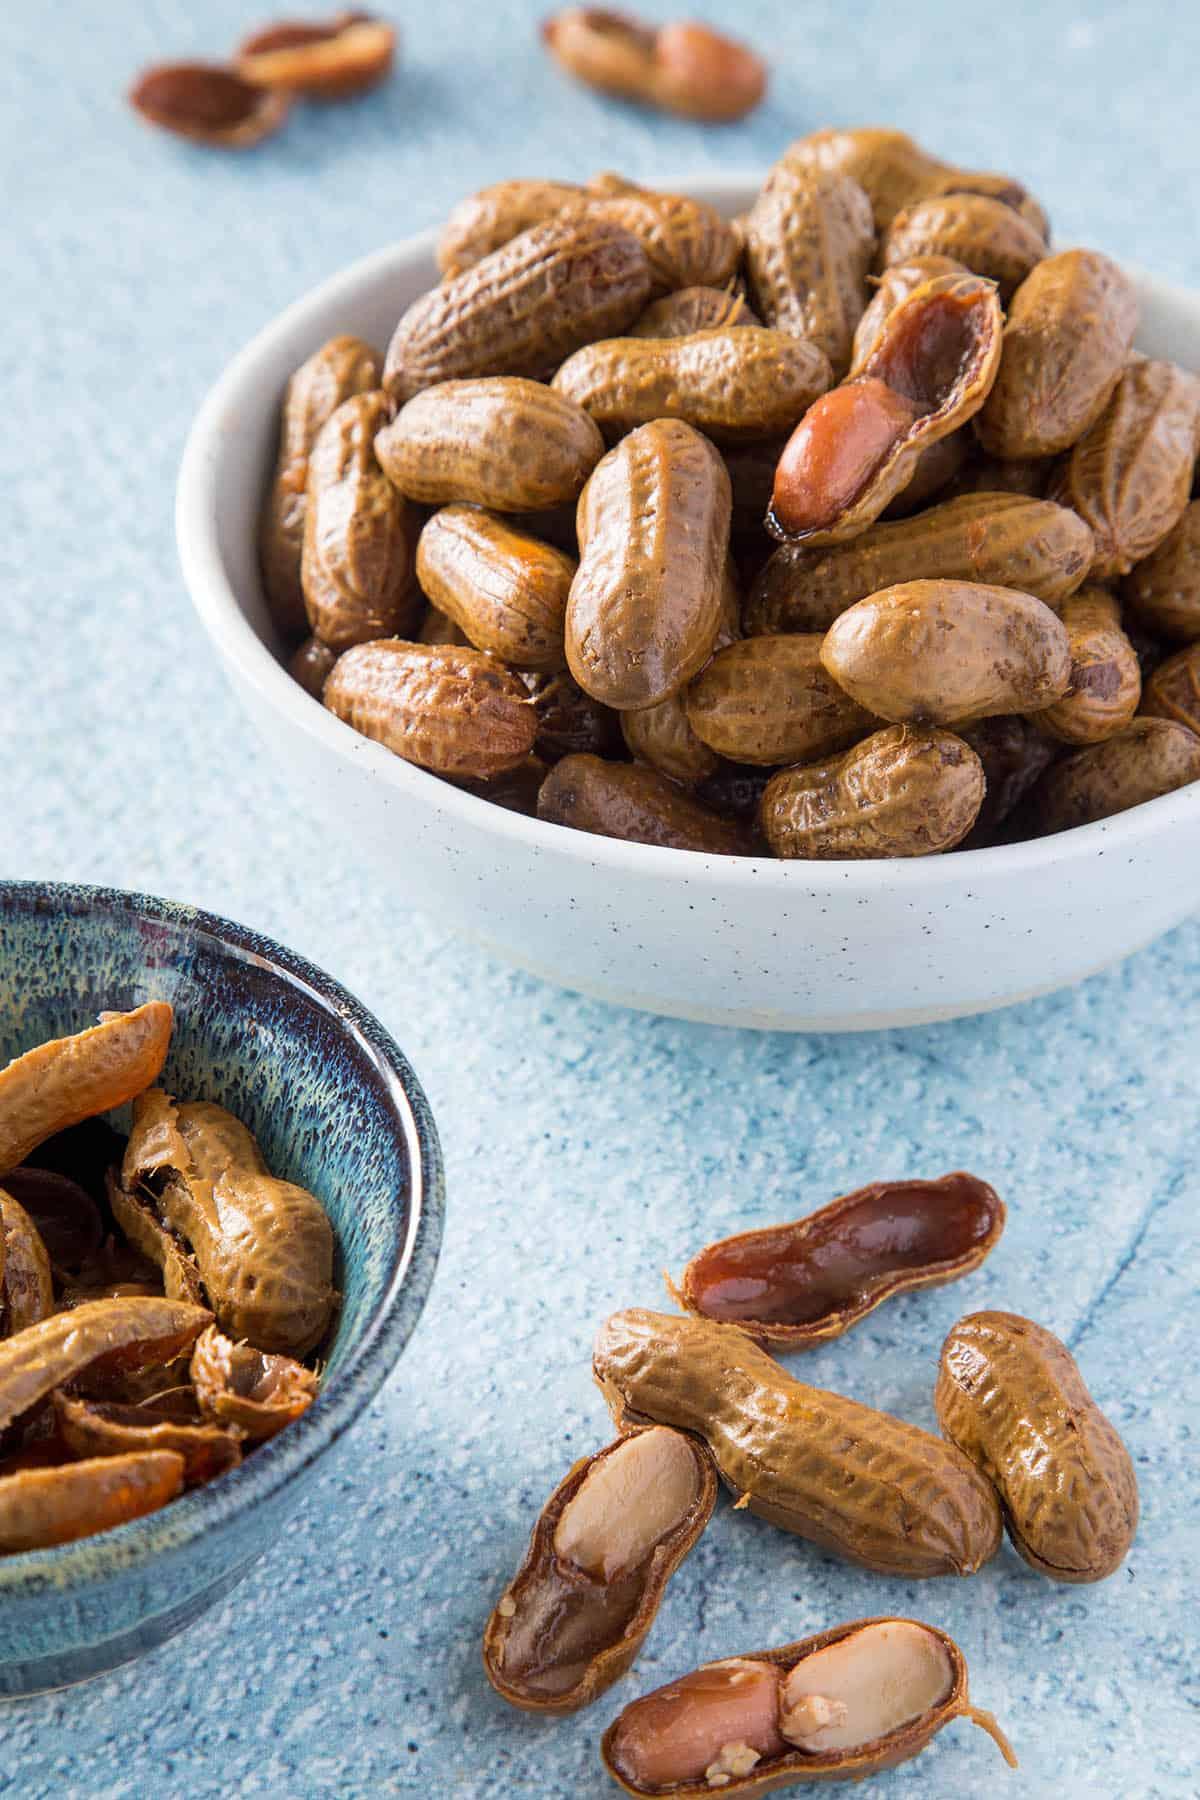 Cajun Boiled Peanuts in a bowl